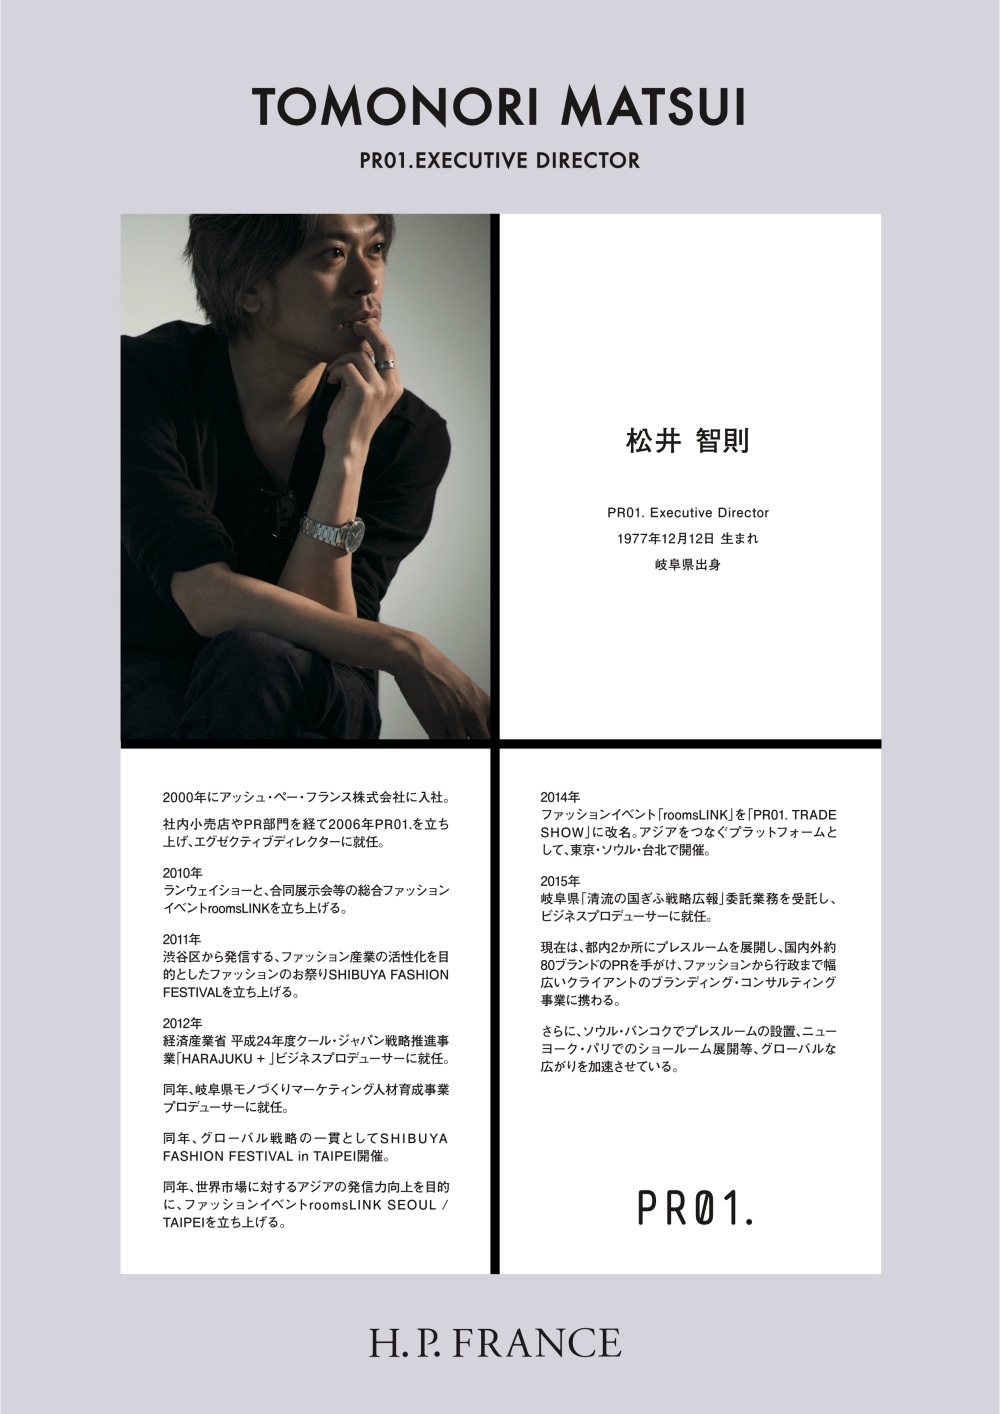 matsui_HPF_people_PROFILE_20160524_2